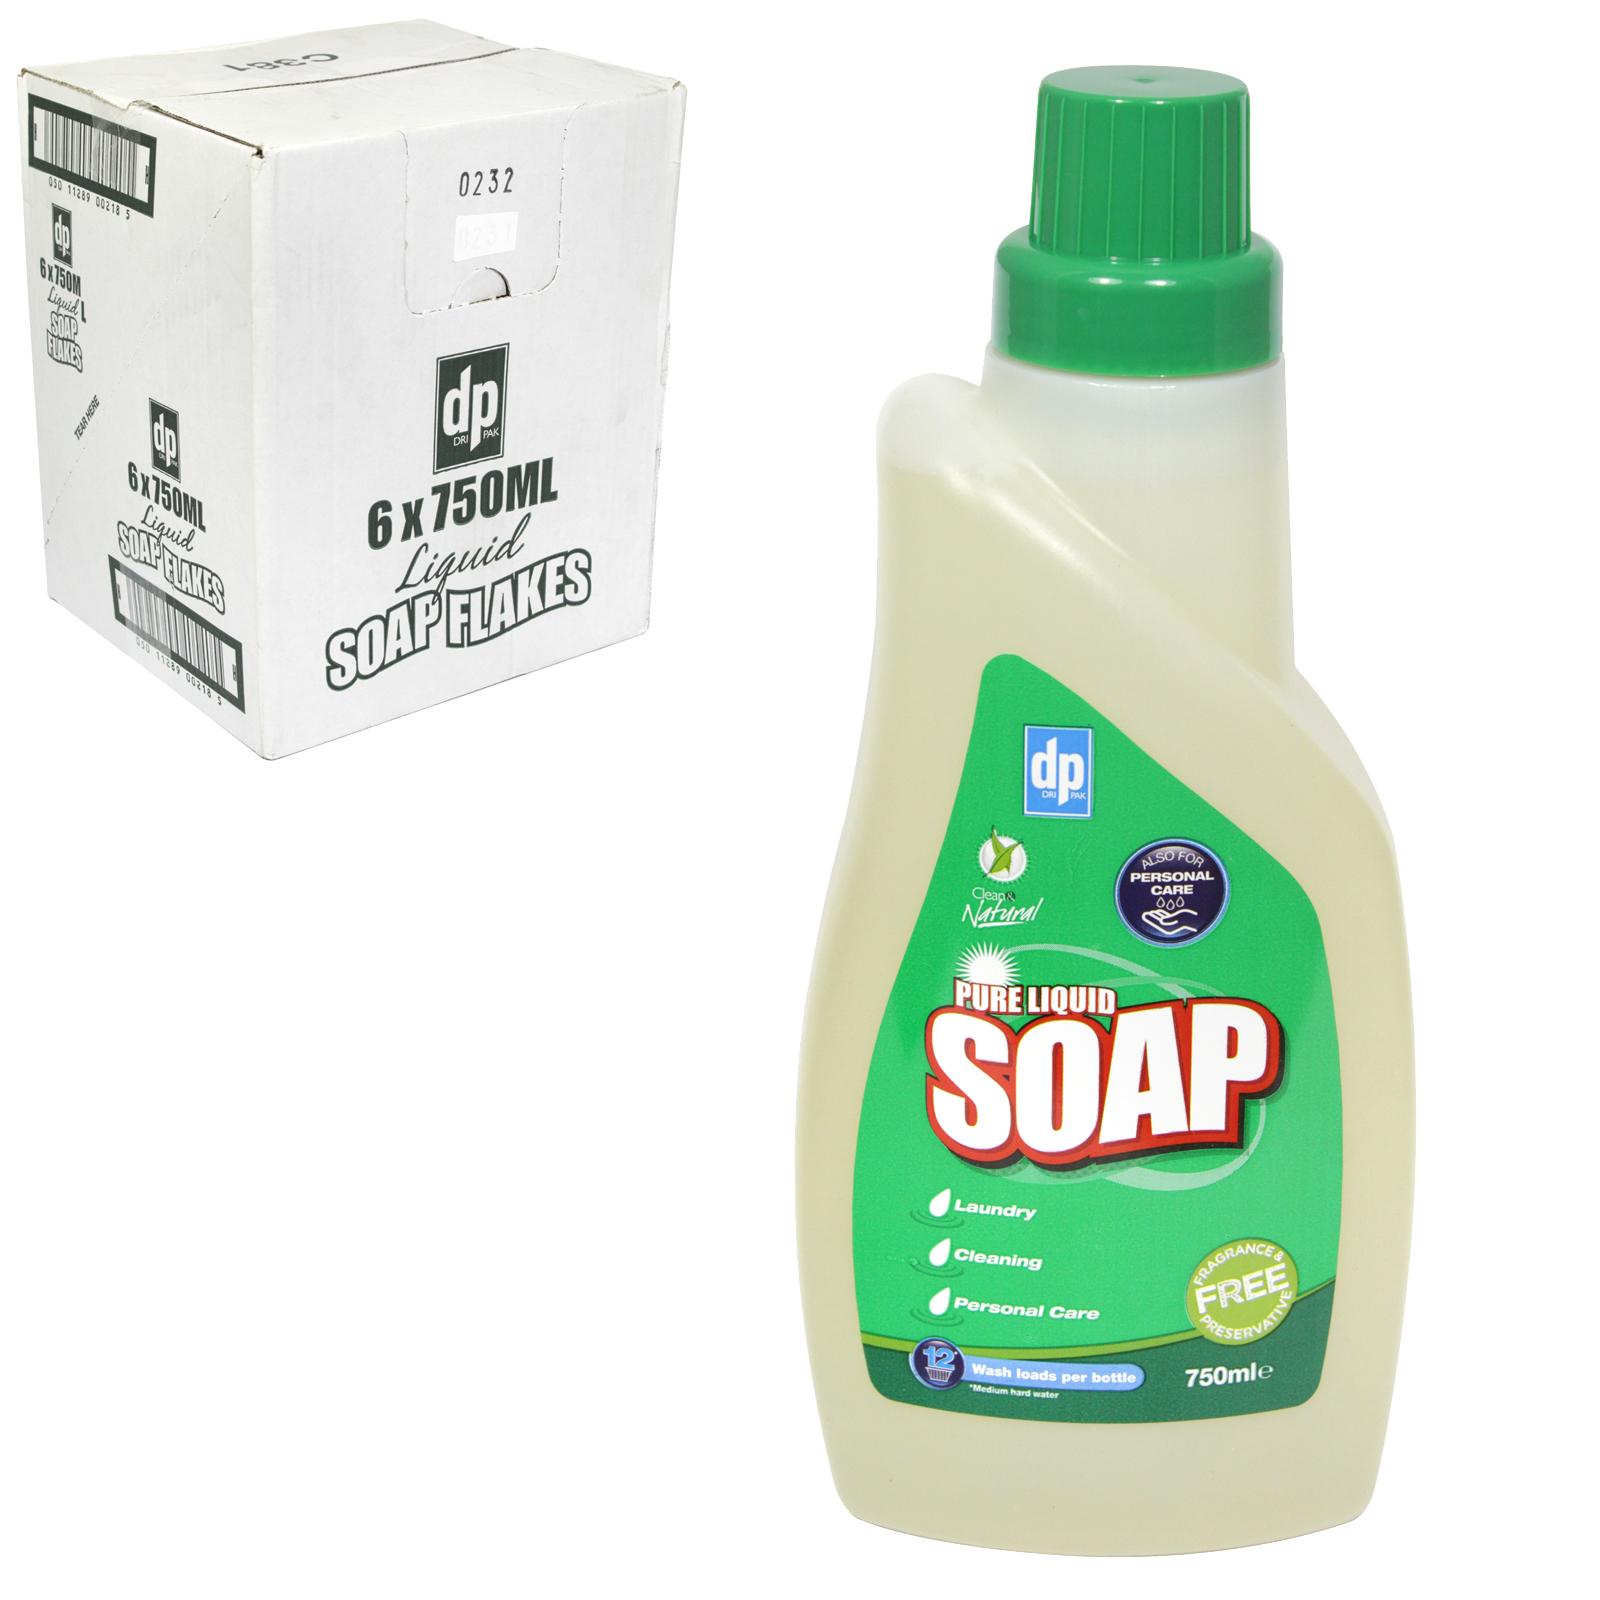 DRI-PAK LIQUID SOAP FLAKES 12 WASH X6